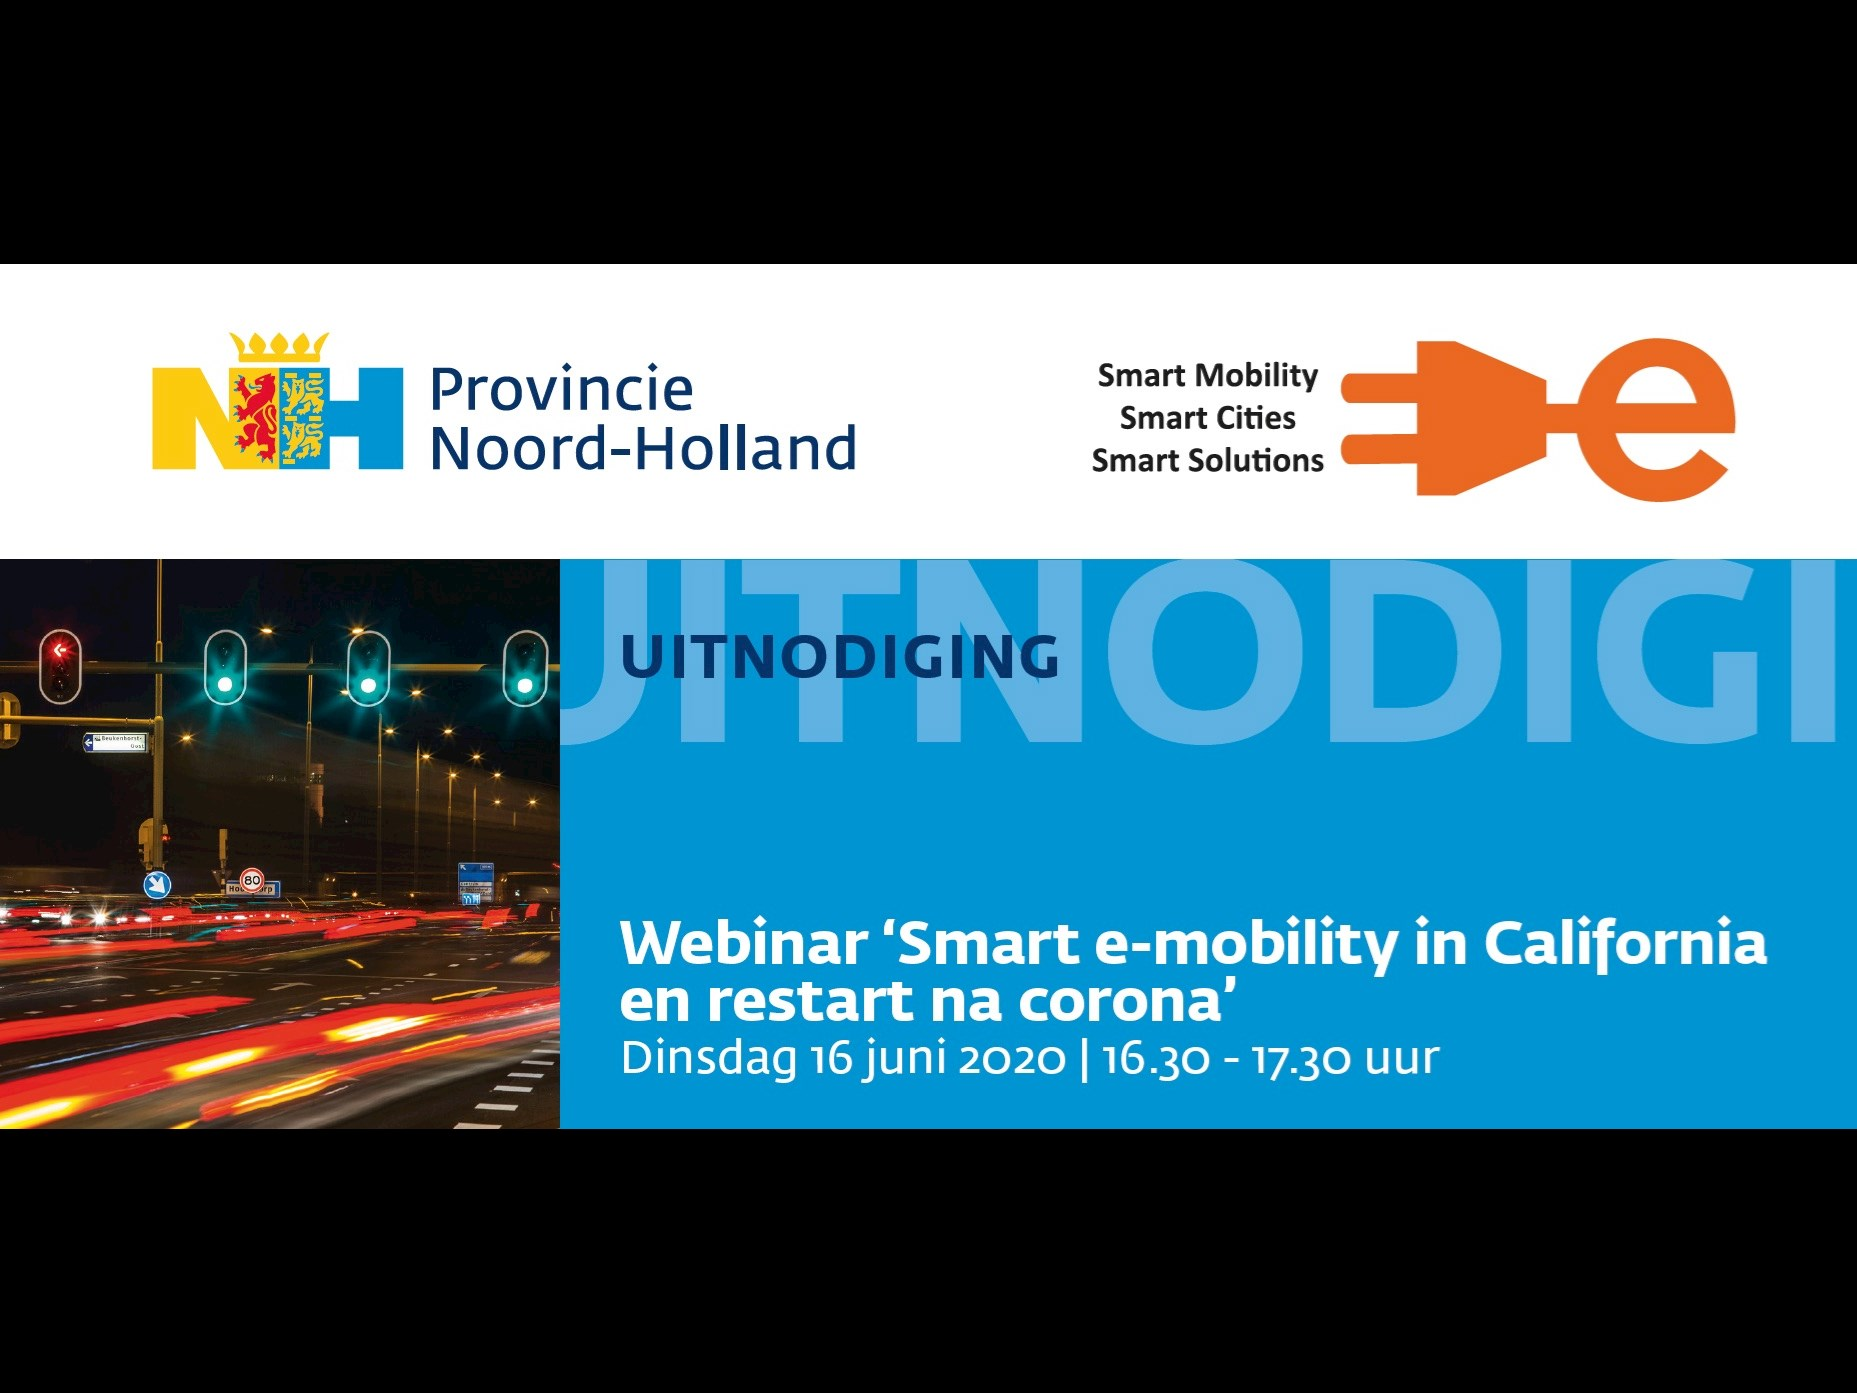 UITNODIGING: Webinar 'Smart e-mobility in California en restart na corona'